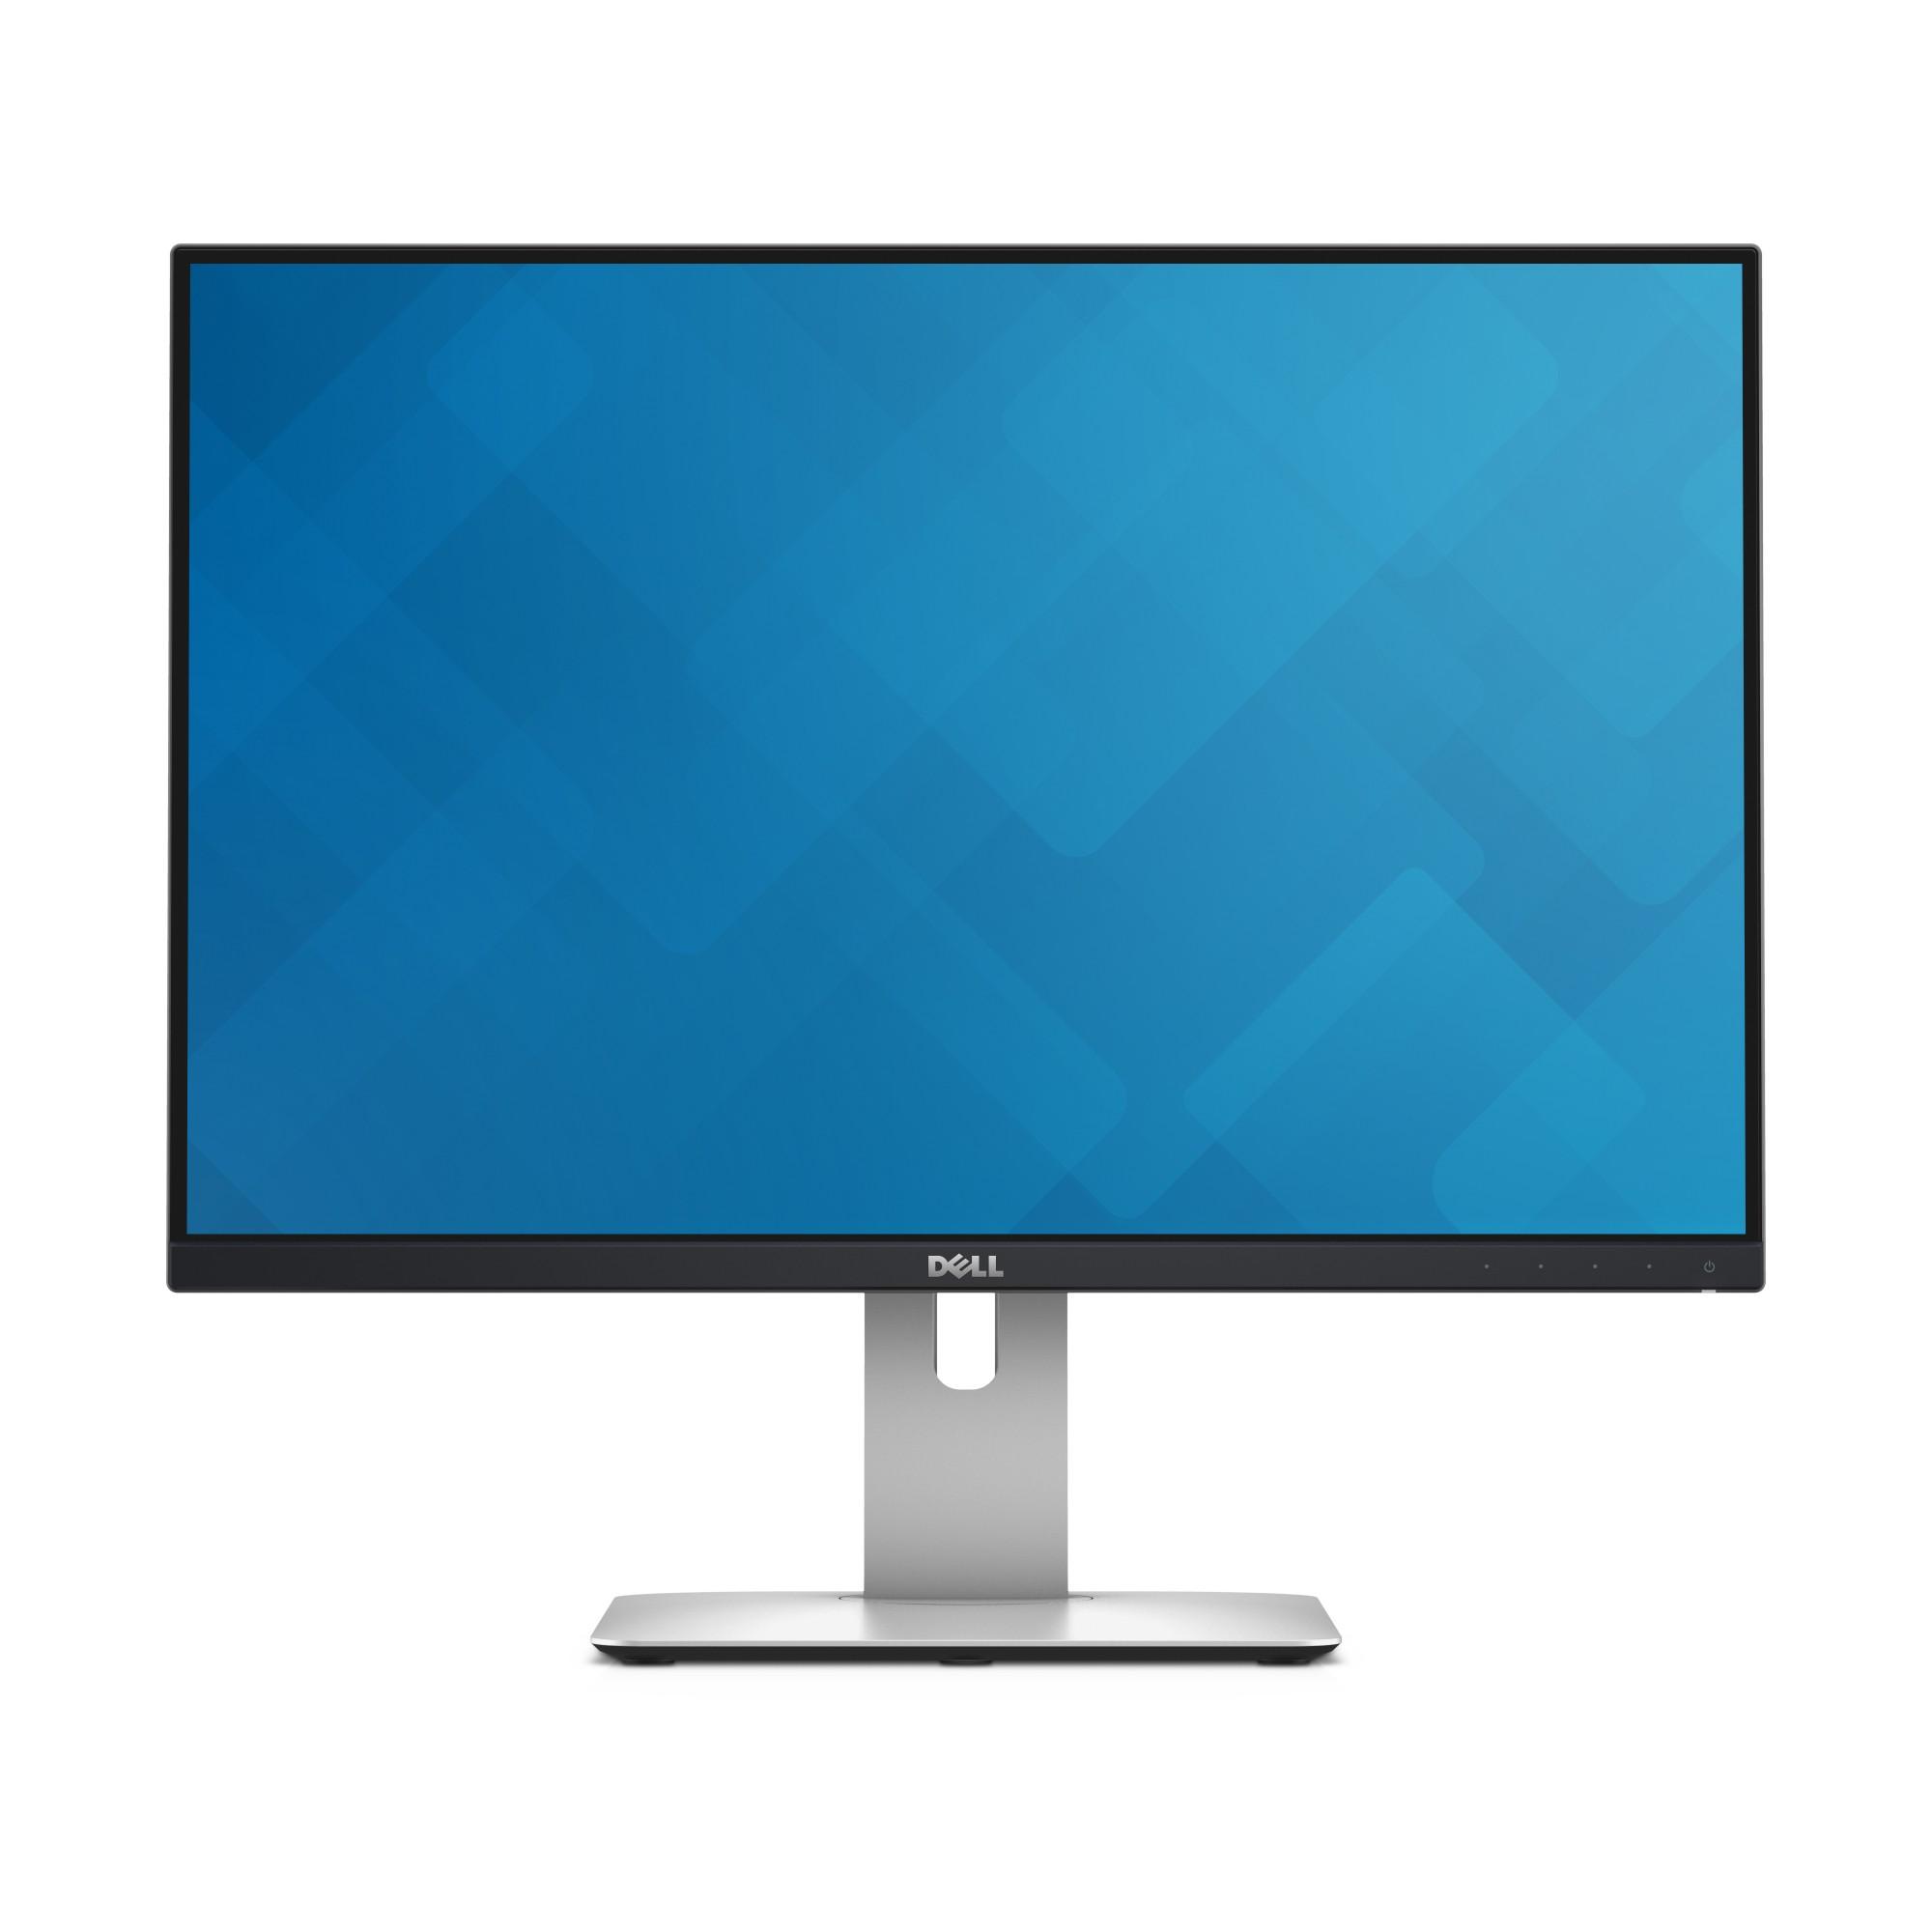 "DELL UltraSharp U2415 LED display 61 cm (24"") 1920 x 1200 pixels WUXGA LCD Black"